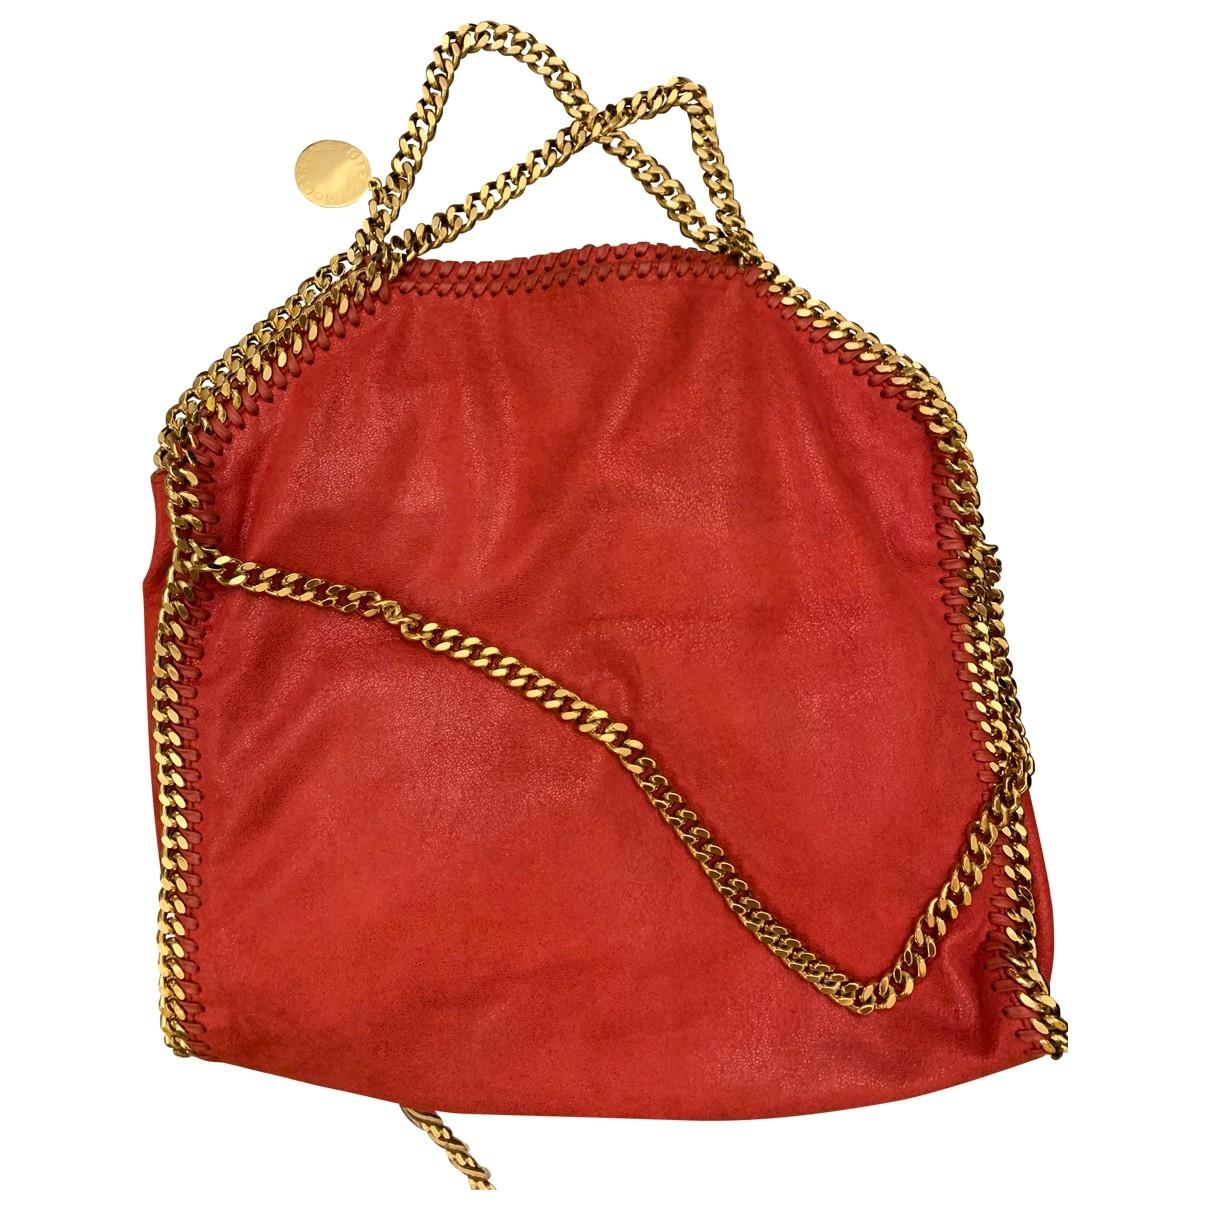 Stella Mccartney - Sac a main Falabella pour femme en toile - rouge